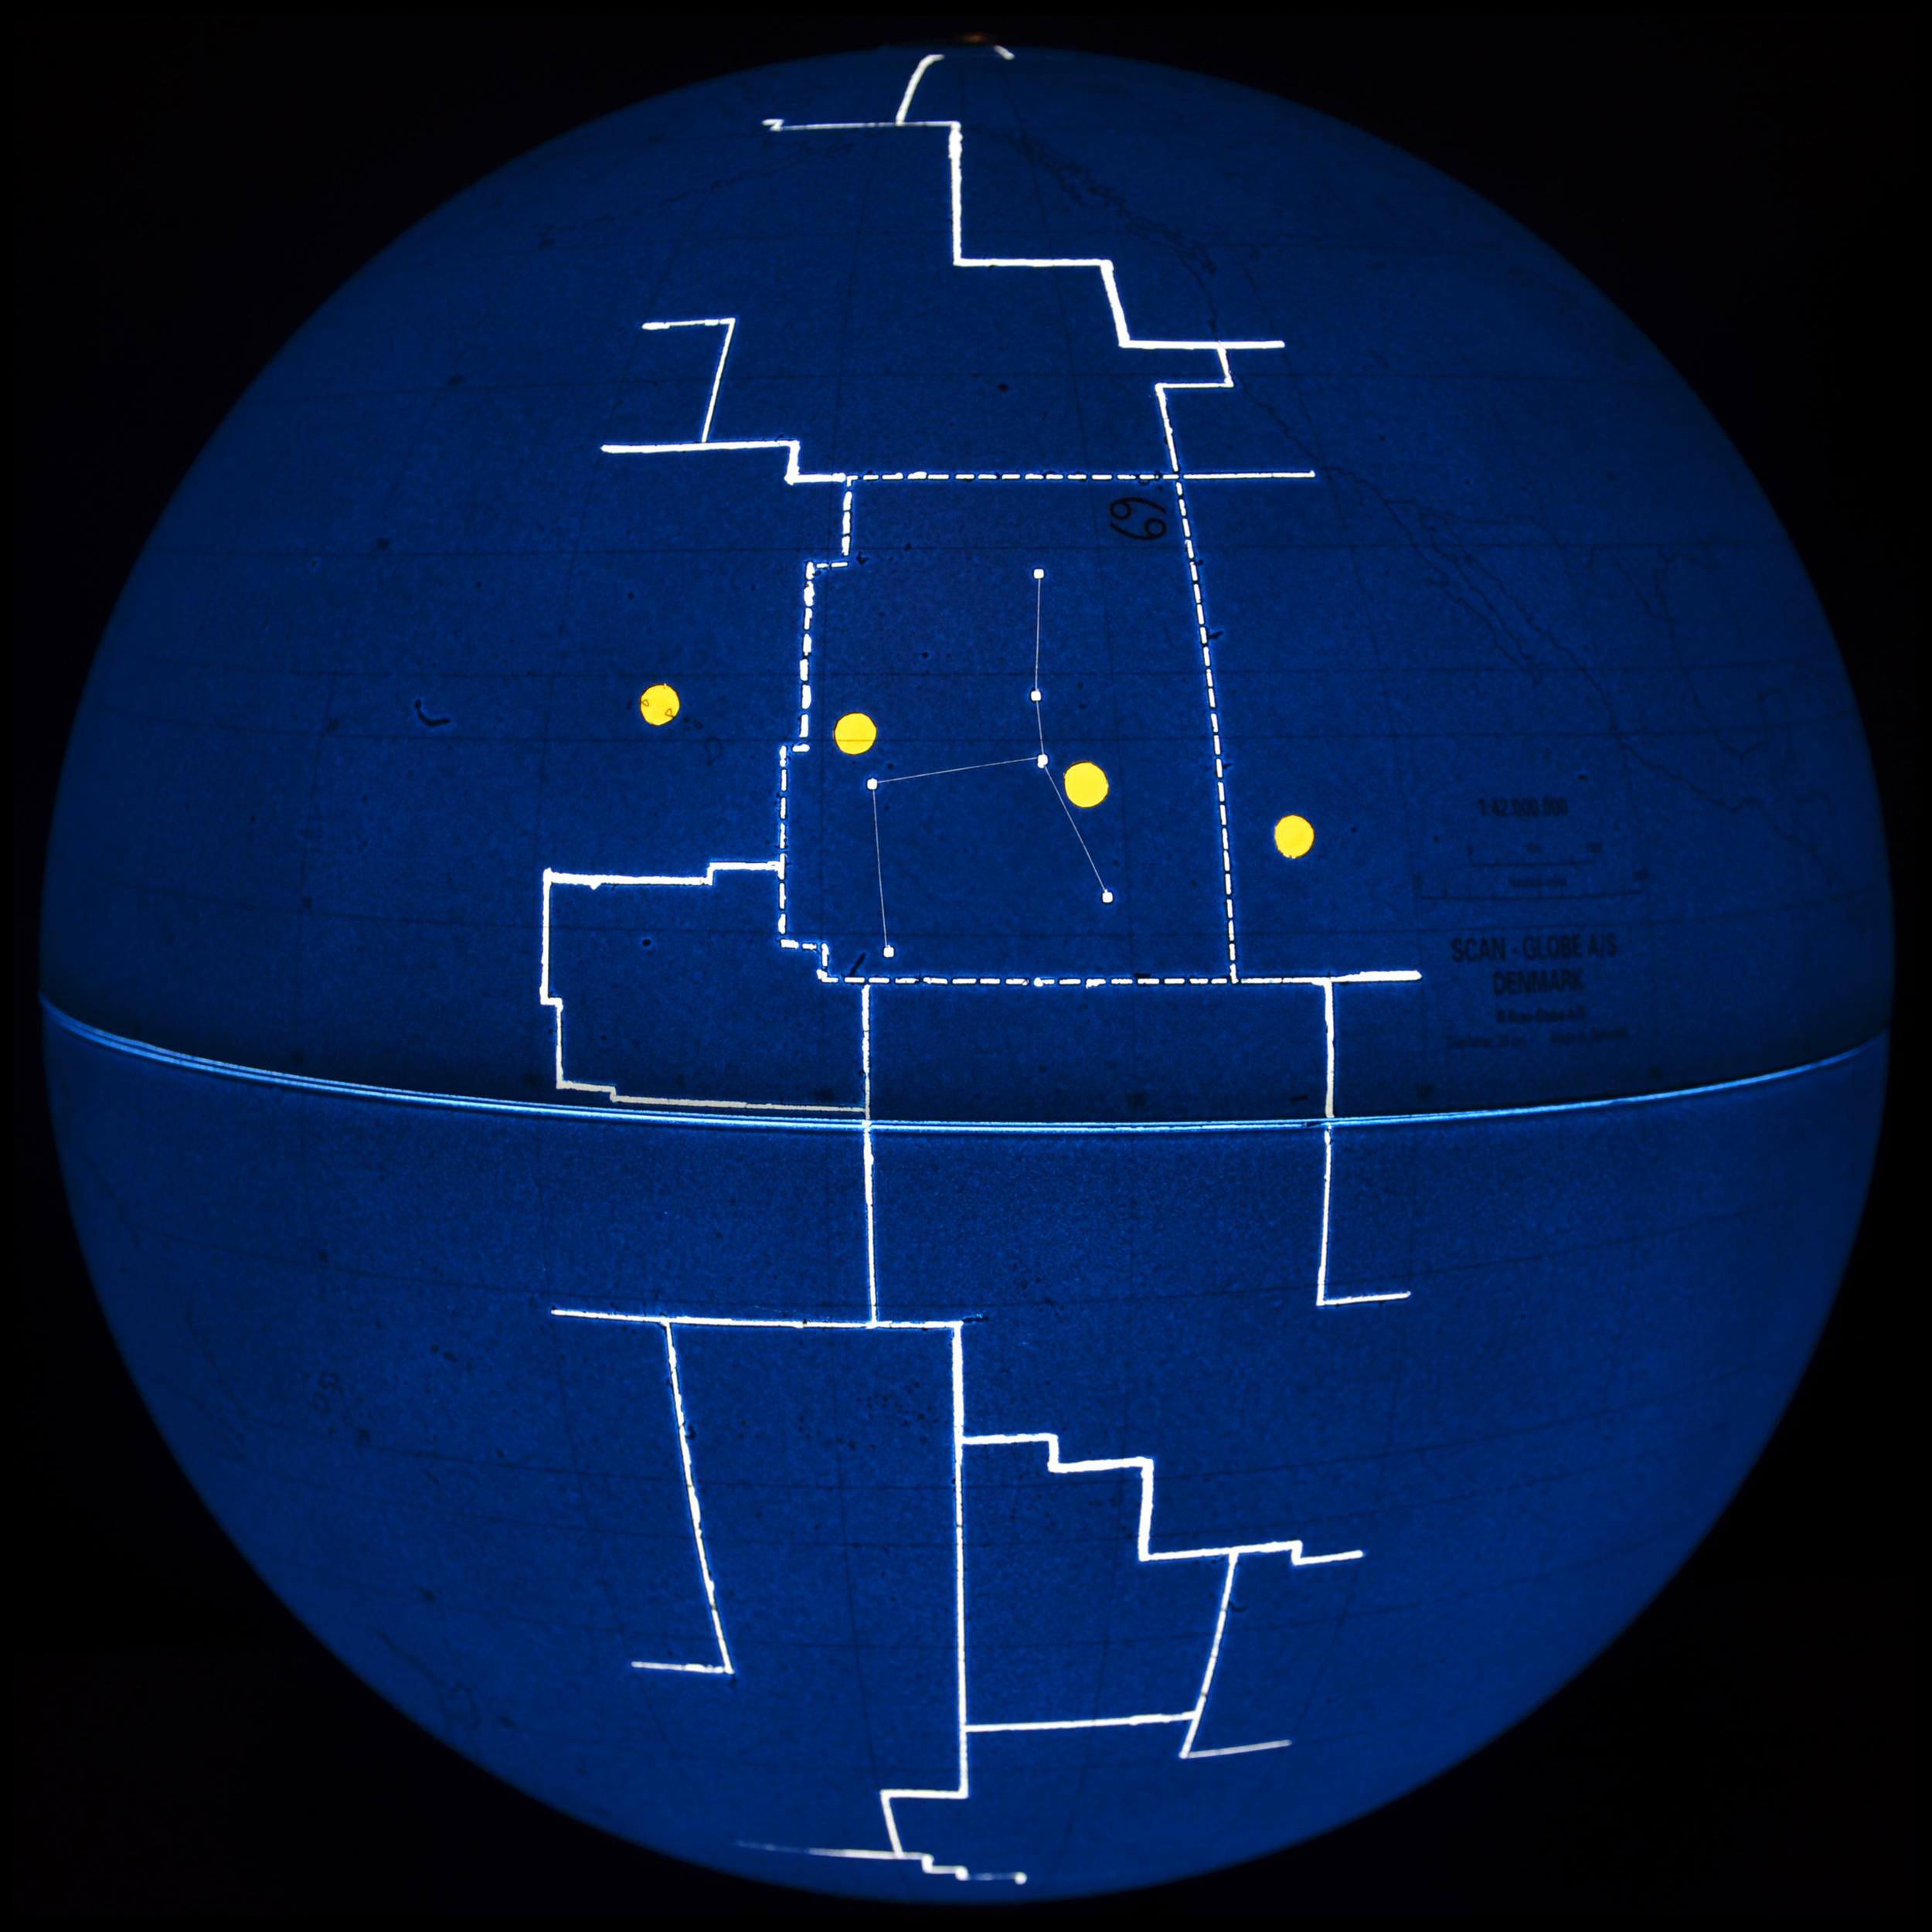 345-5D_CelestialSphere_IG1_6528_edit.jpg